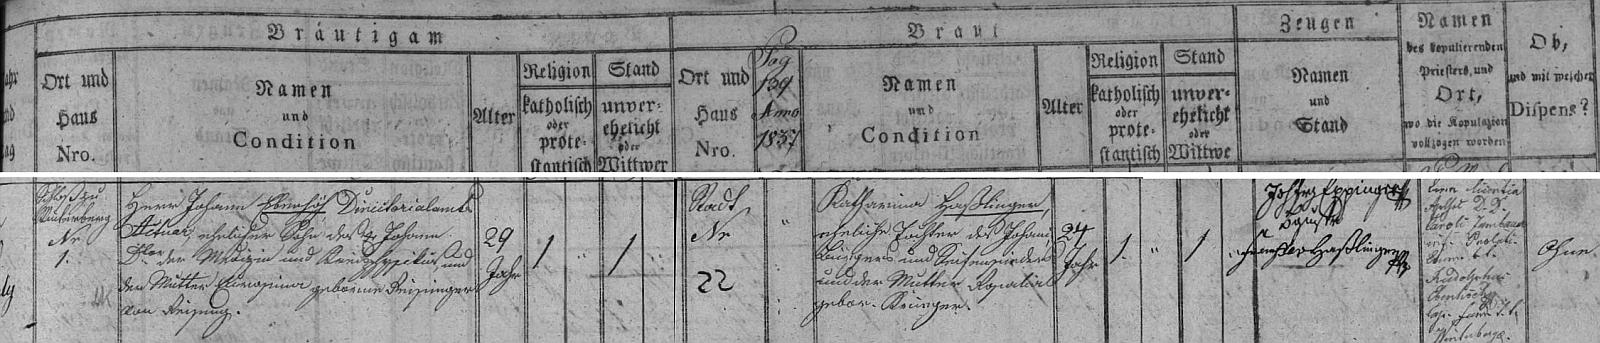 Záznam o jeho svatbě v českokrumlovské matrice